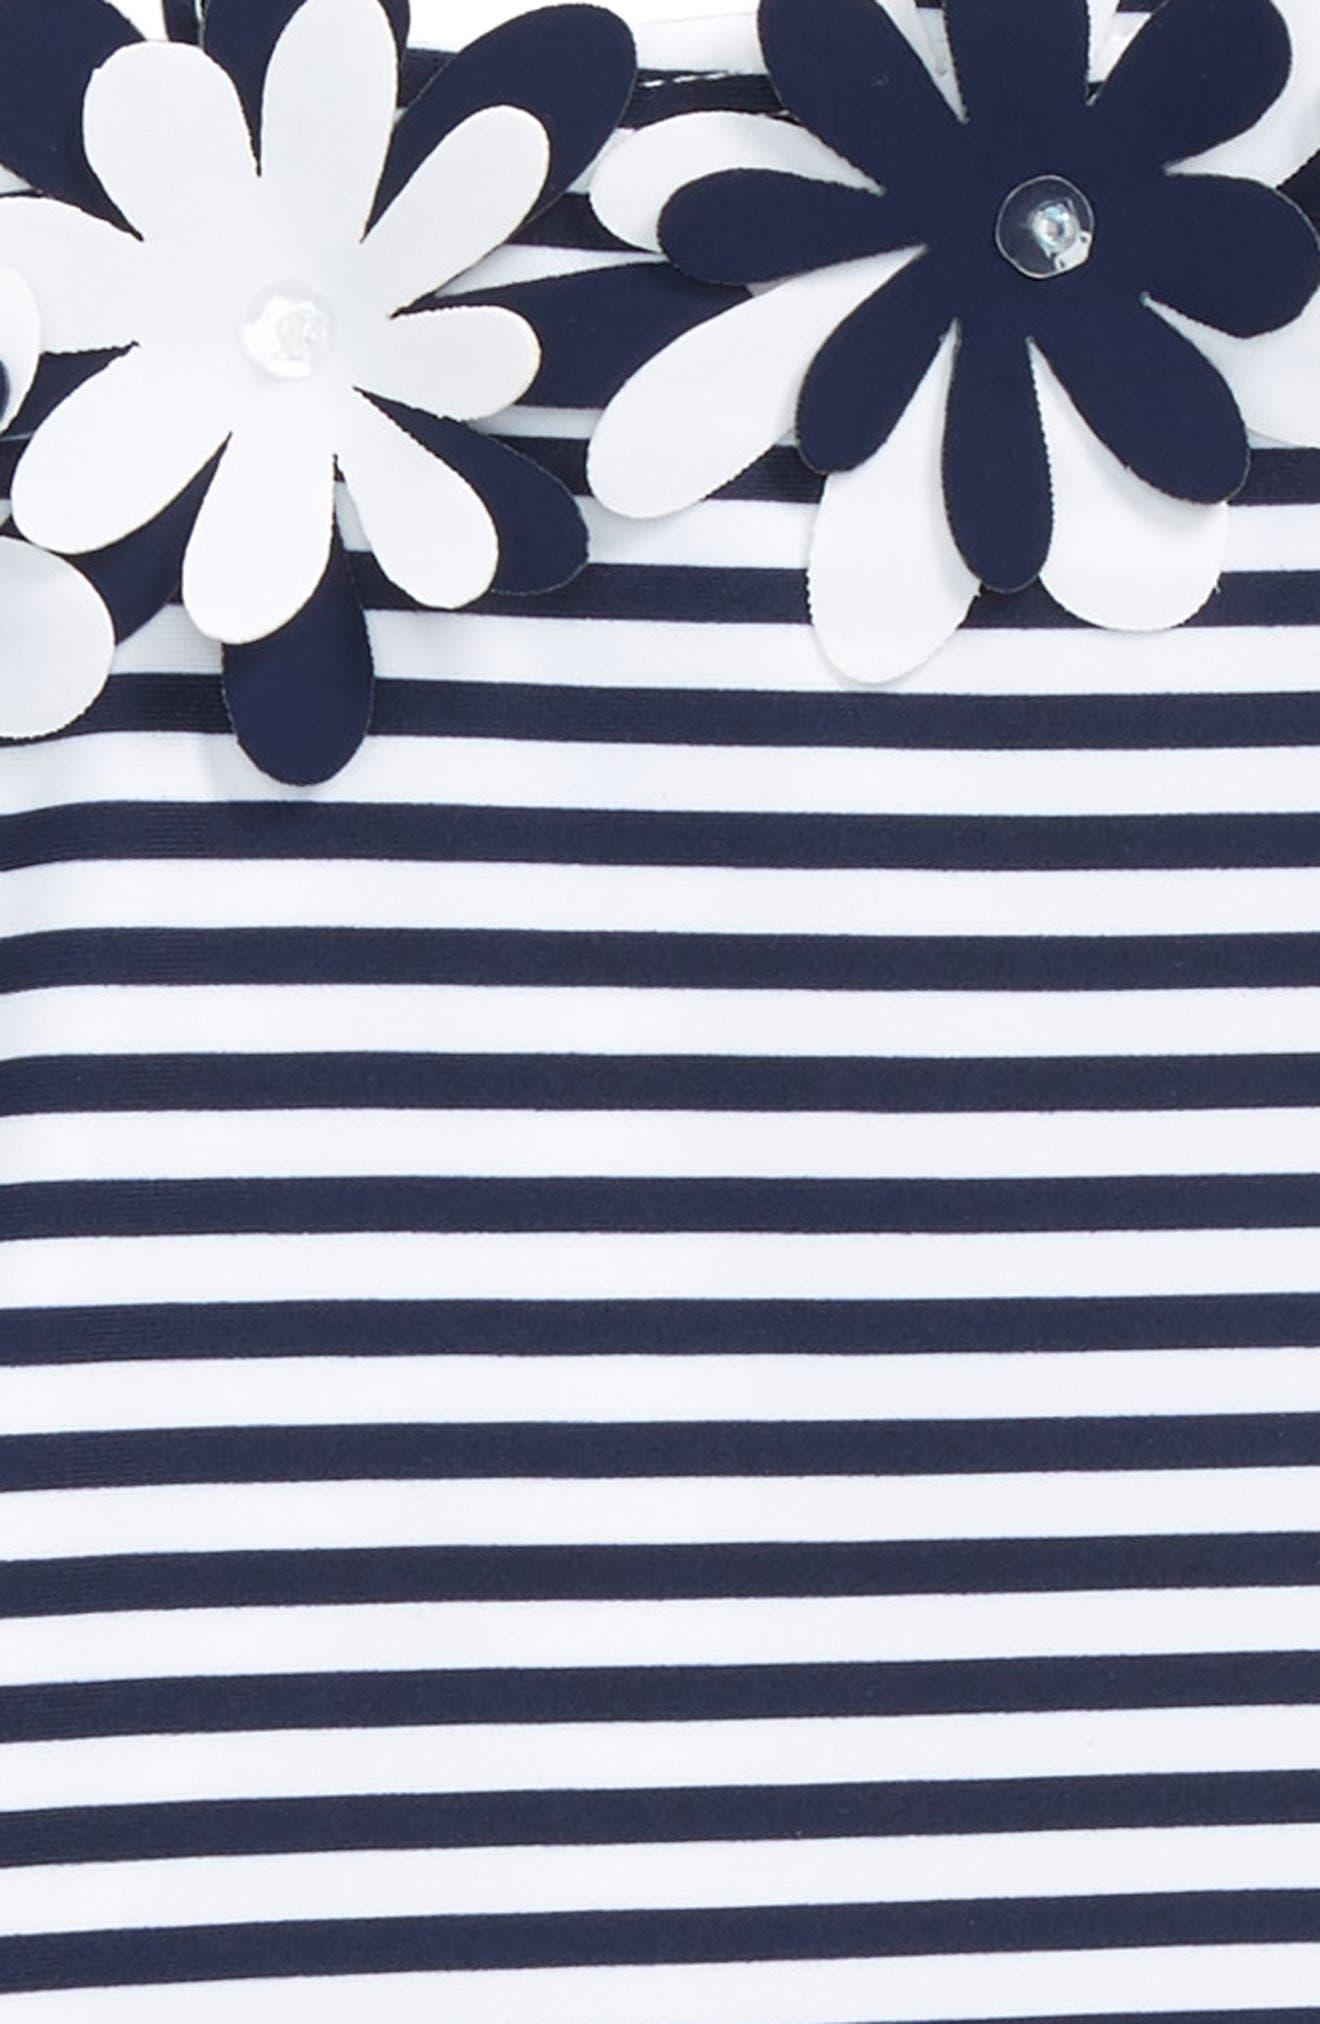 Stripe One-Piece Swimsuit,                             Alternate thumbnail 2, color,                             101